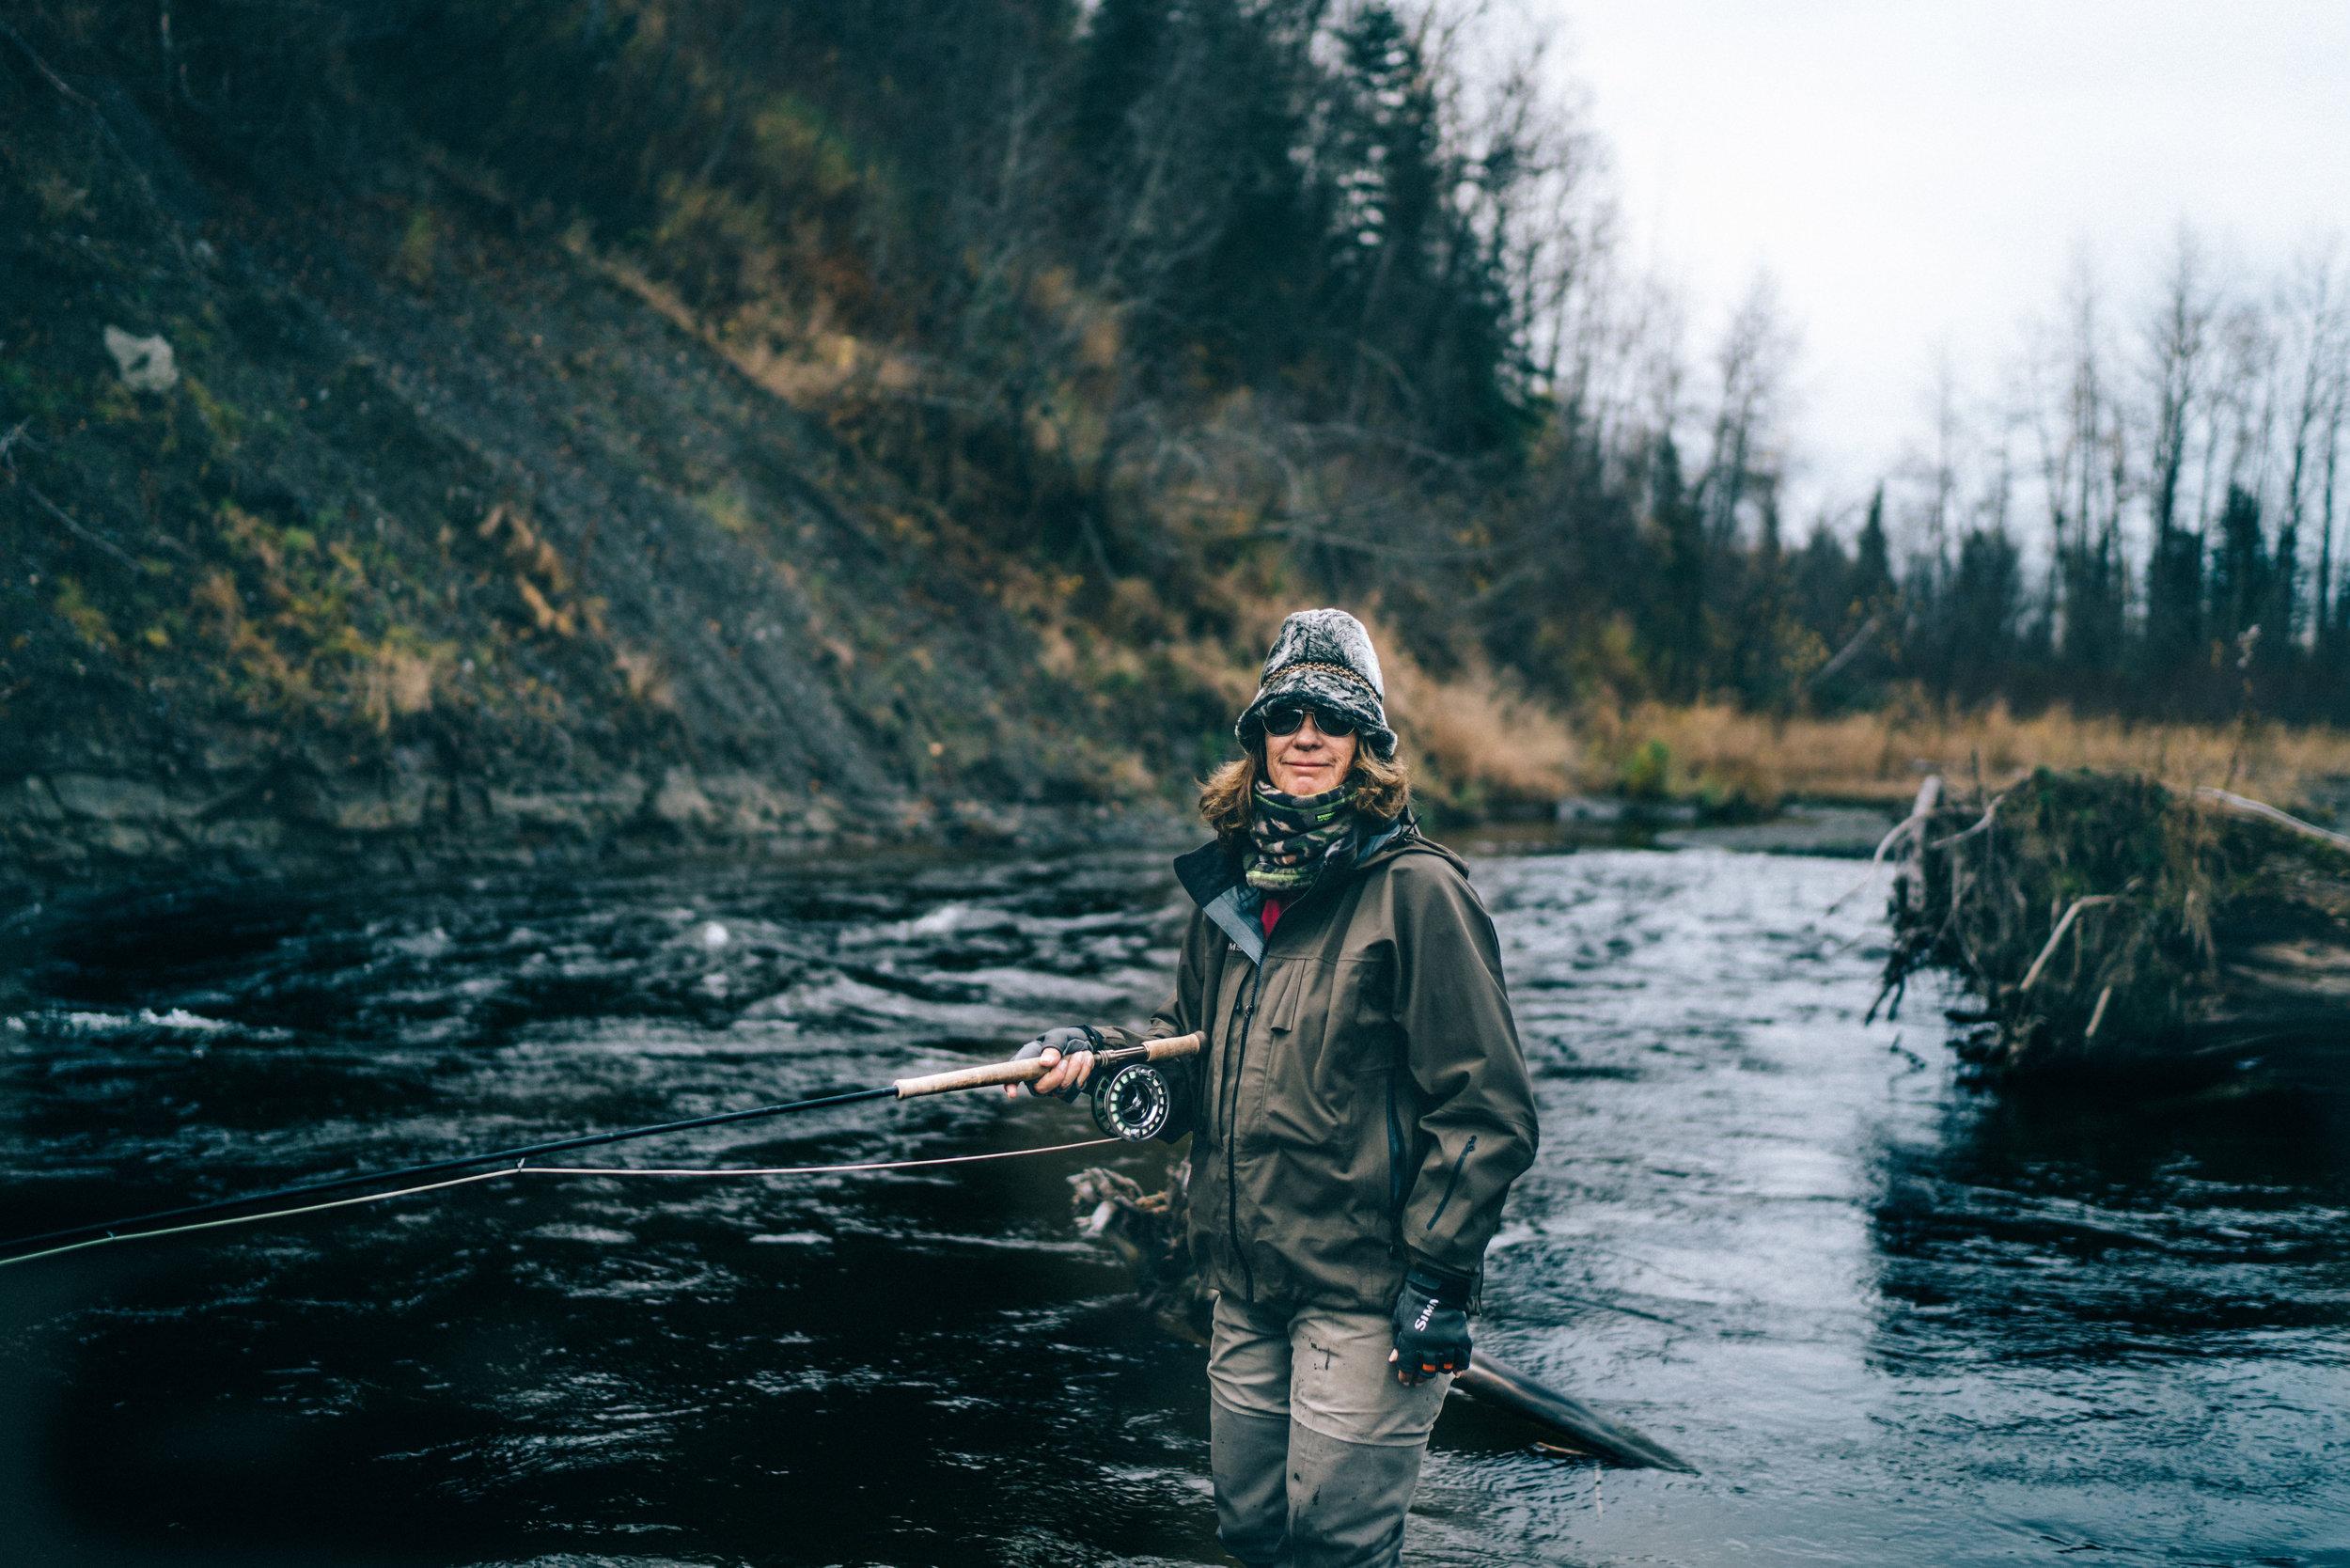 KOC-Kristen-Alaska-web.jpg